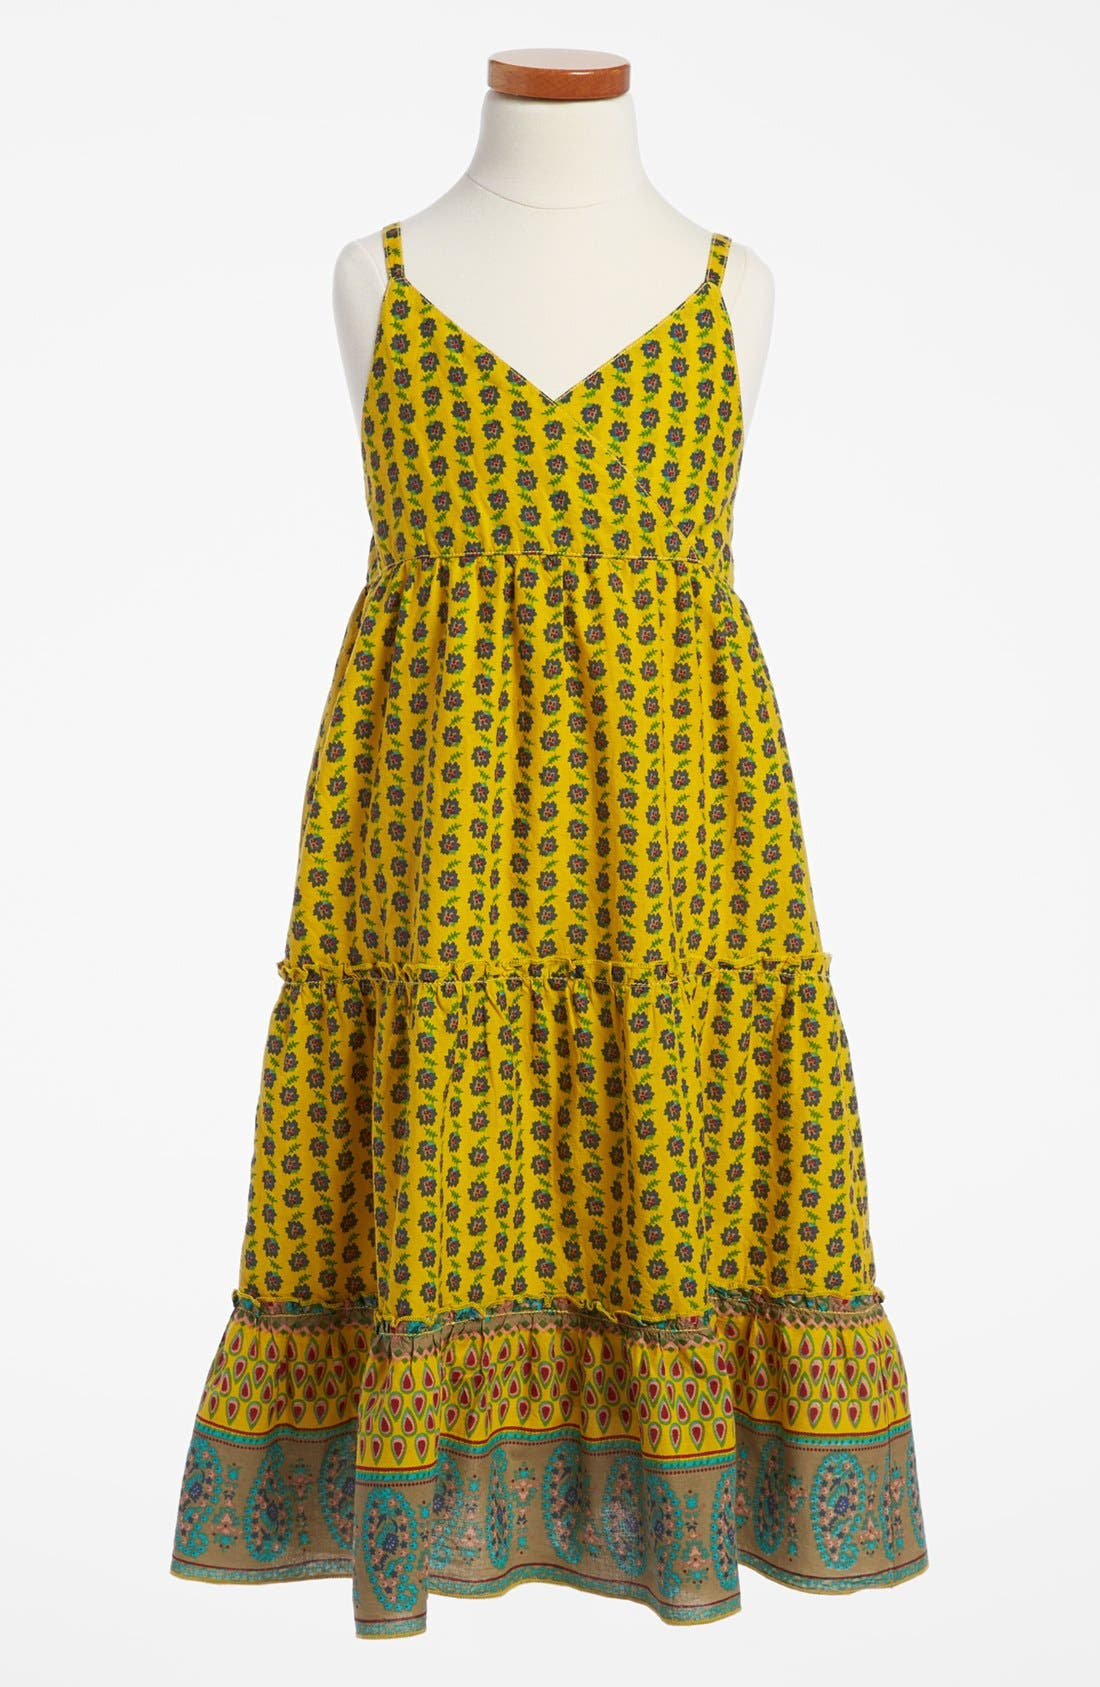 Main Image - Peek 'Alyssa' Sleeveless Dress (Toddler Girls, Little Girls & Big Girls)